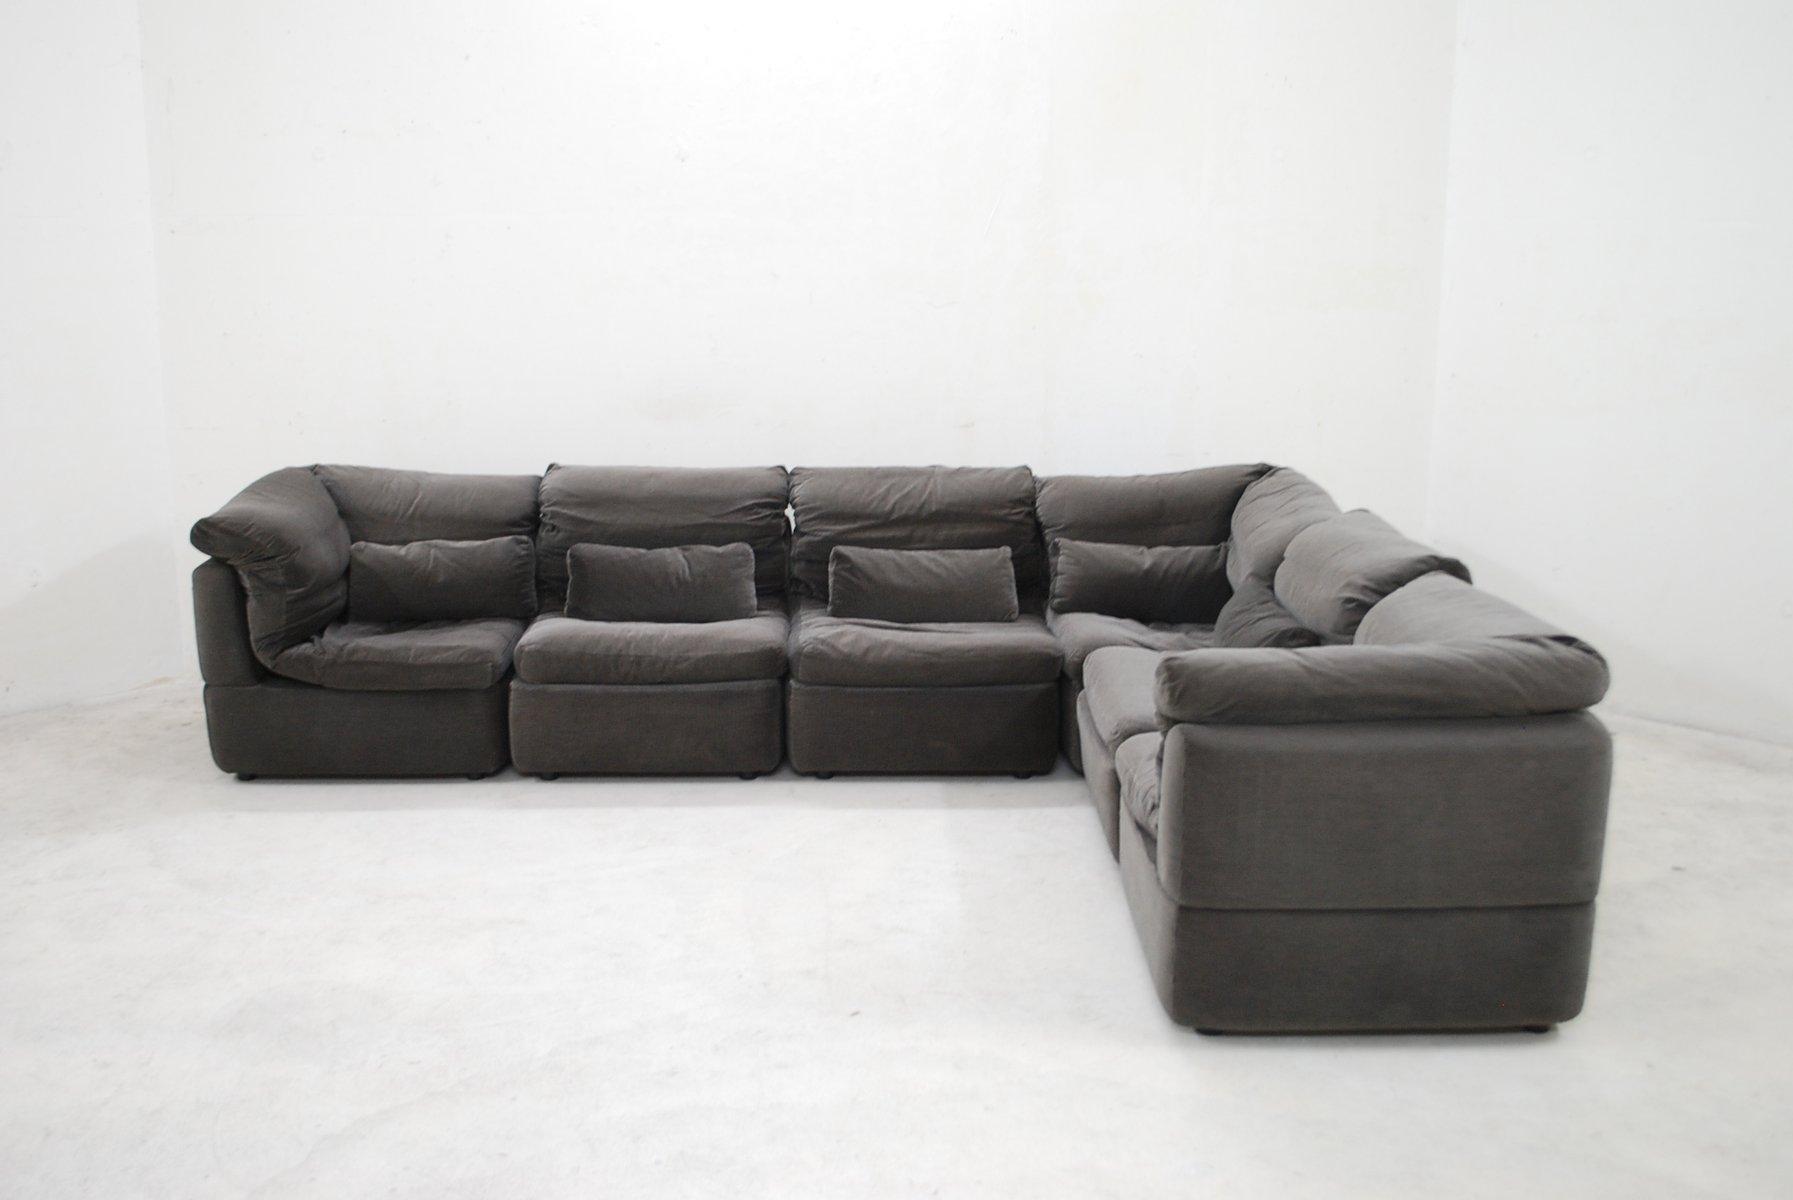 comfortable rolf benz sofa. Rolf Benz Furniture. Vintage German Modular Sofa From Benz, 1970s Furniture Comfortable